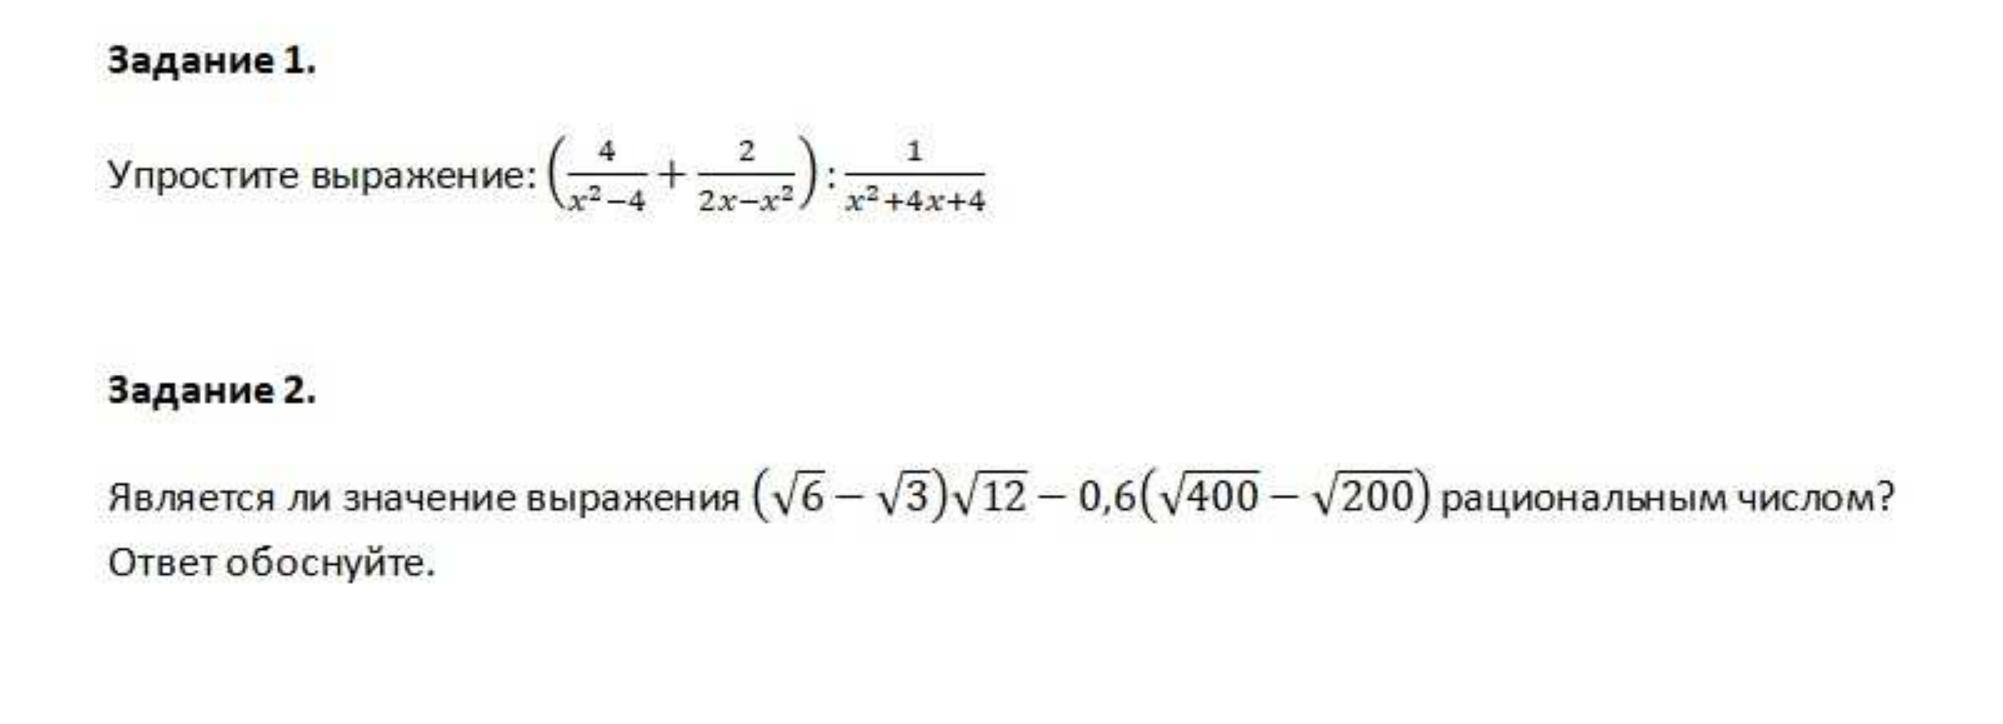 Прошу, помогите идиоту с алгеброй!